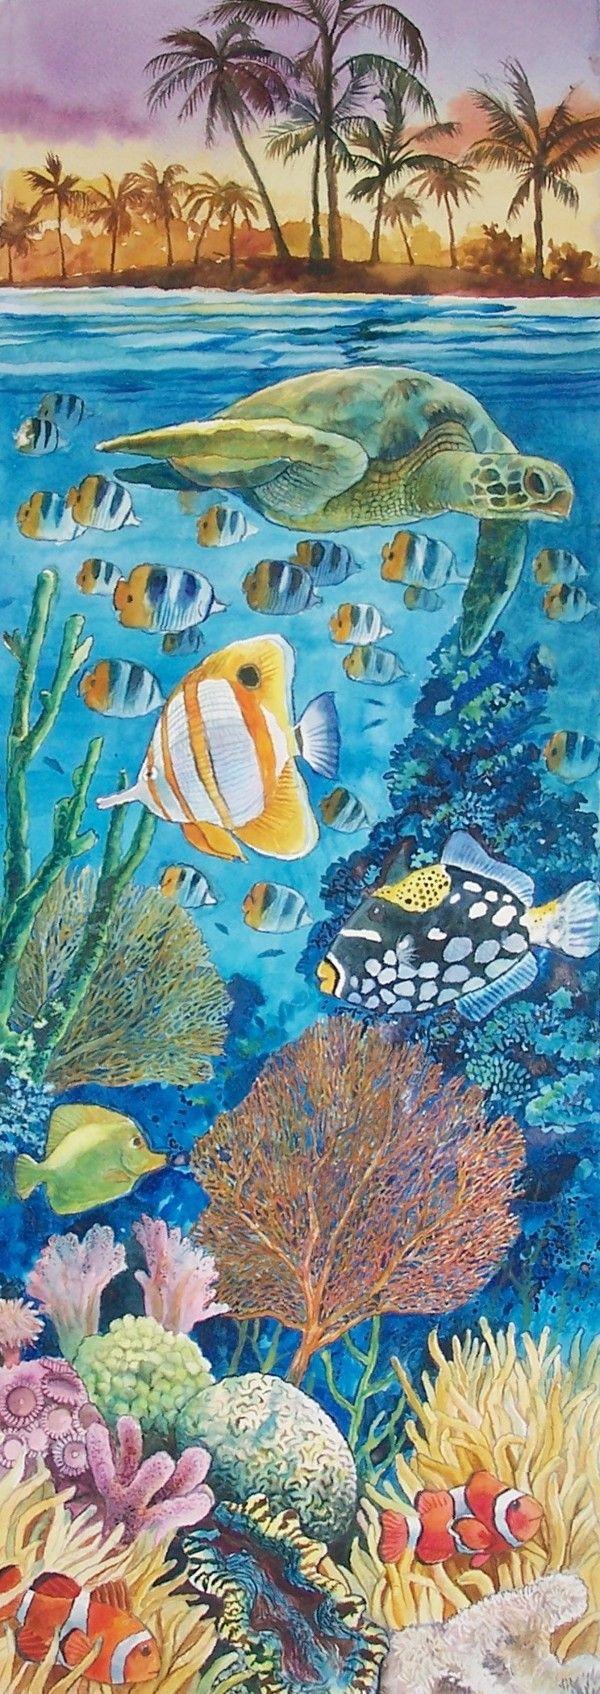 Tropical Reef - Watercolor on paper by Matt Moore, via Behance